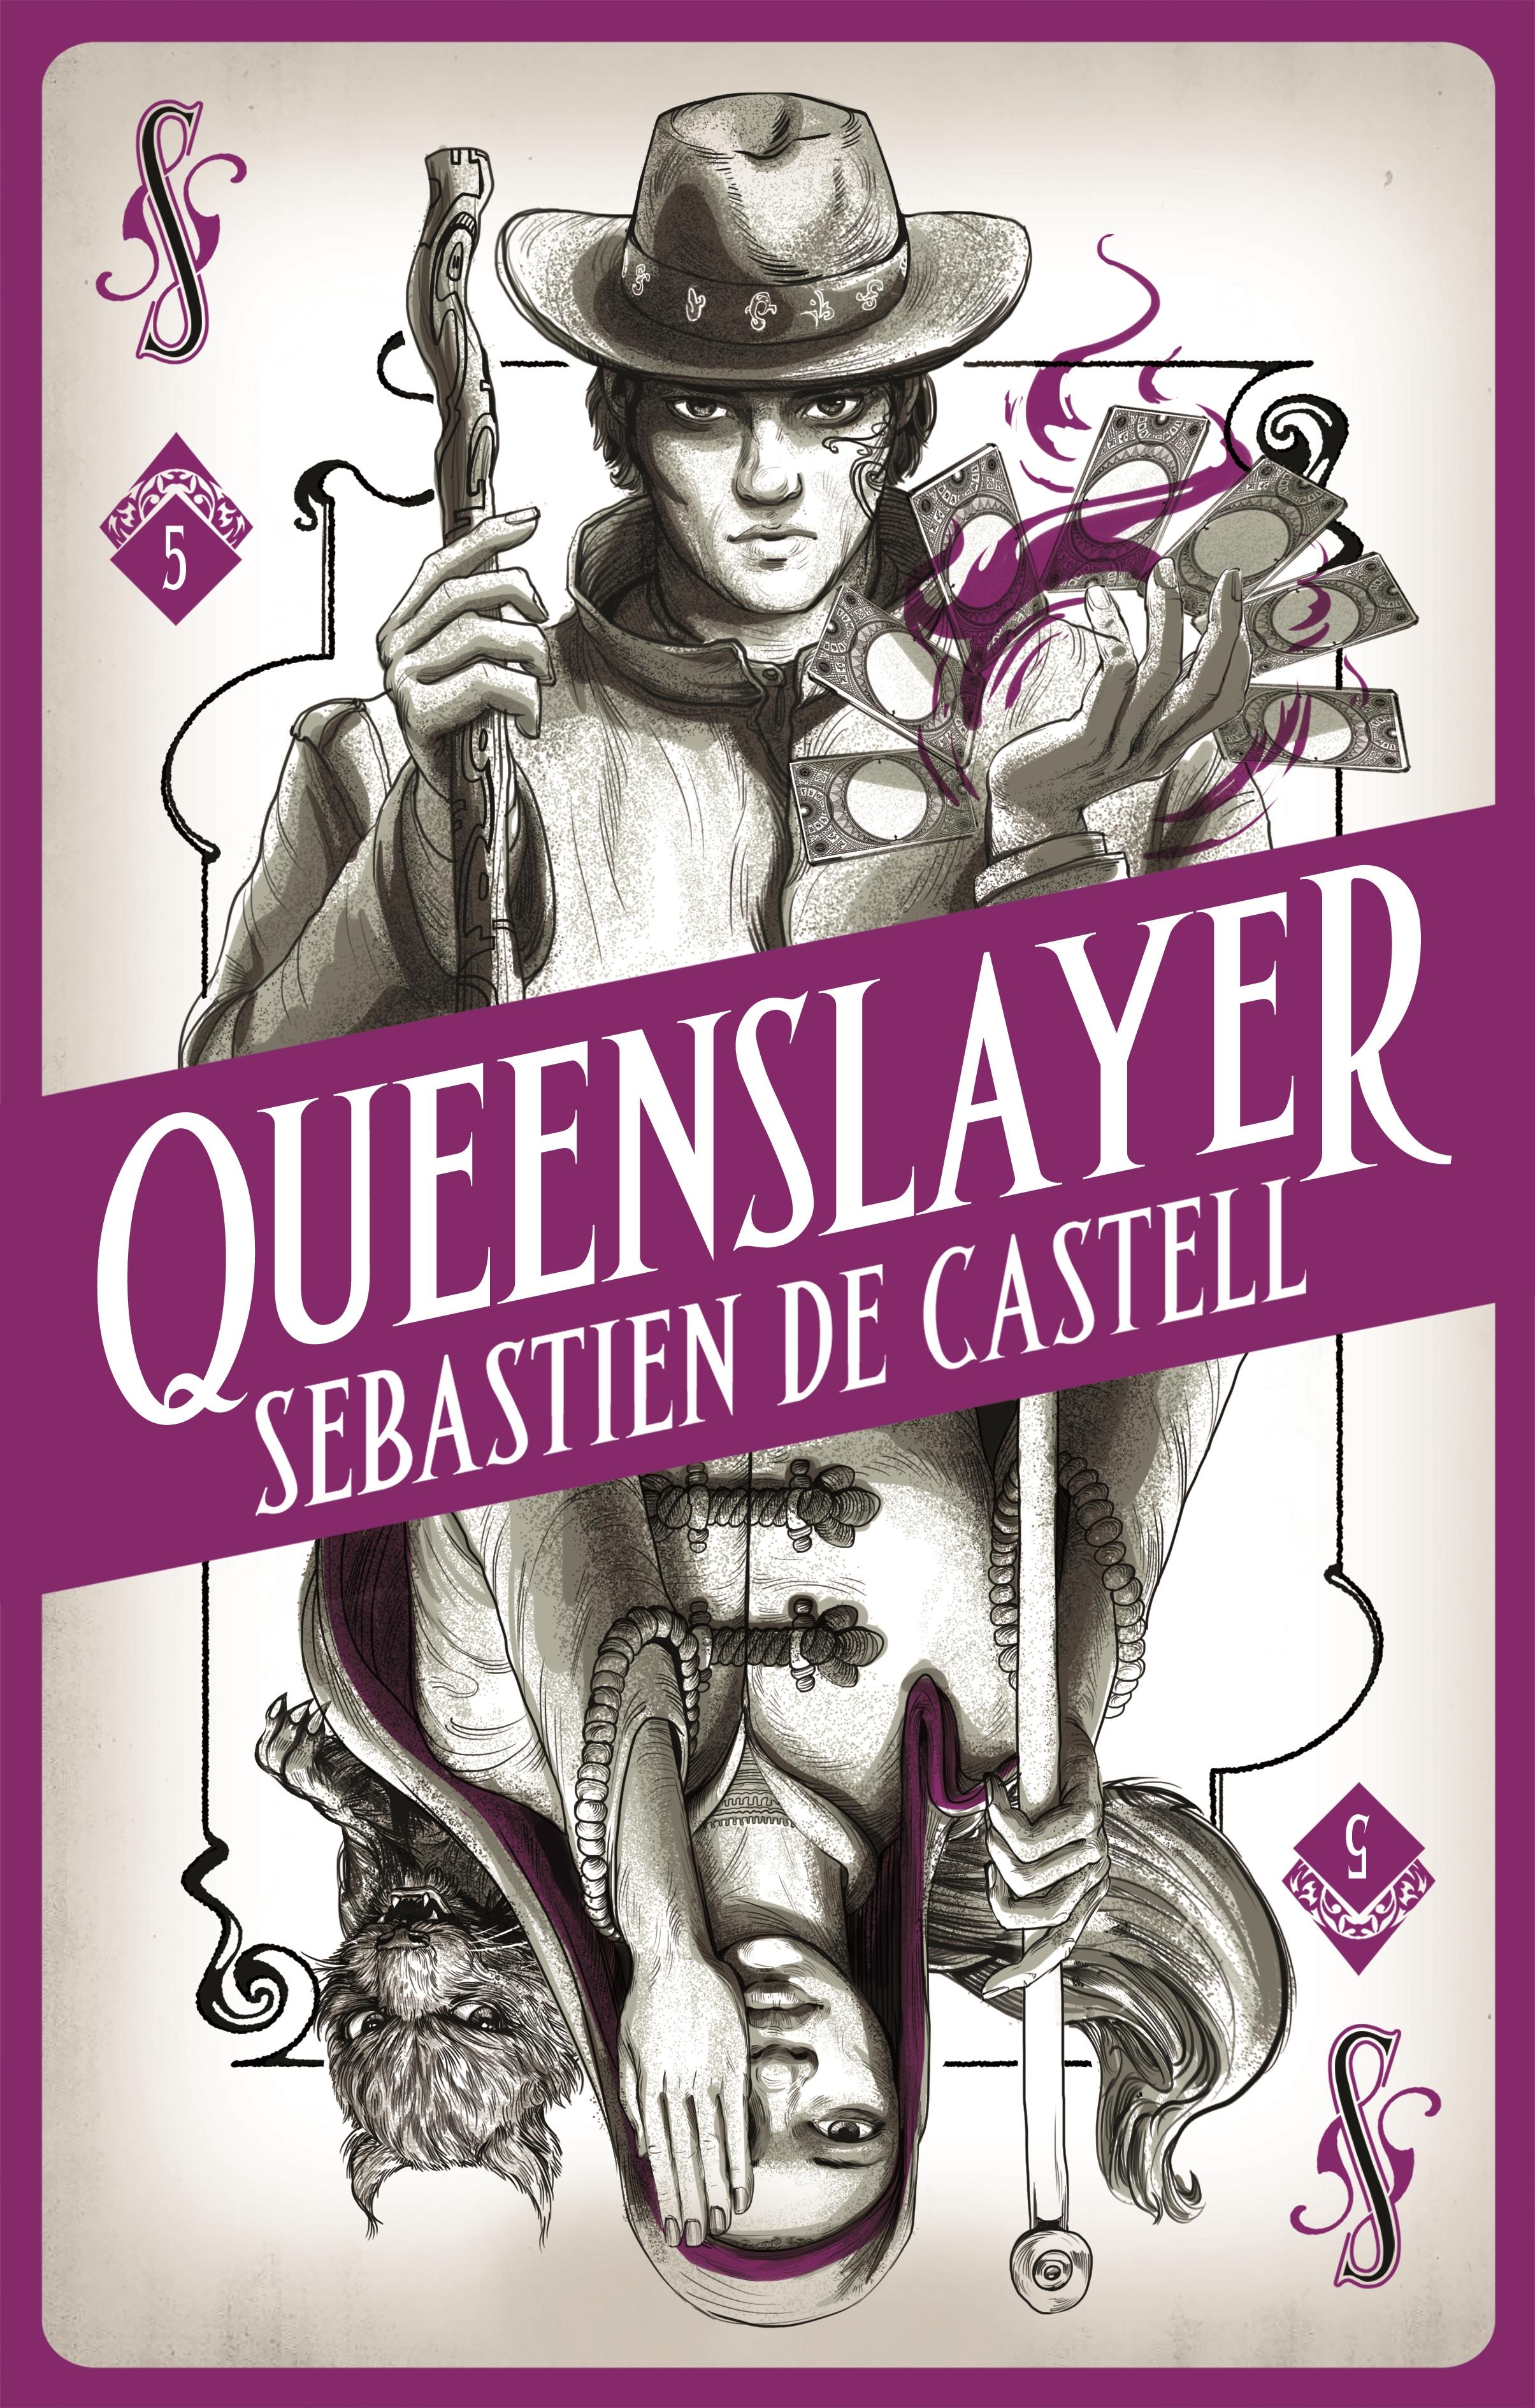 Spellslinger 5: Queenslayer by Sebastien de Castell